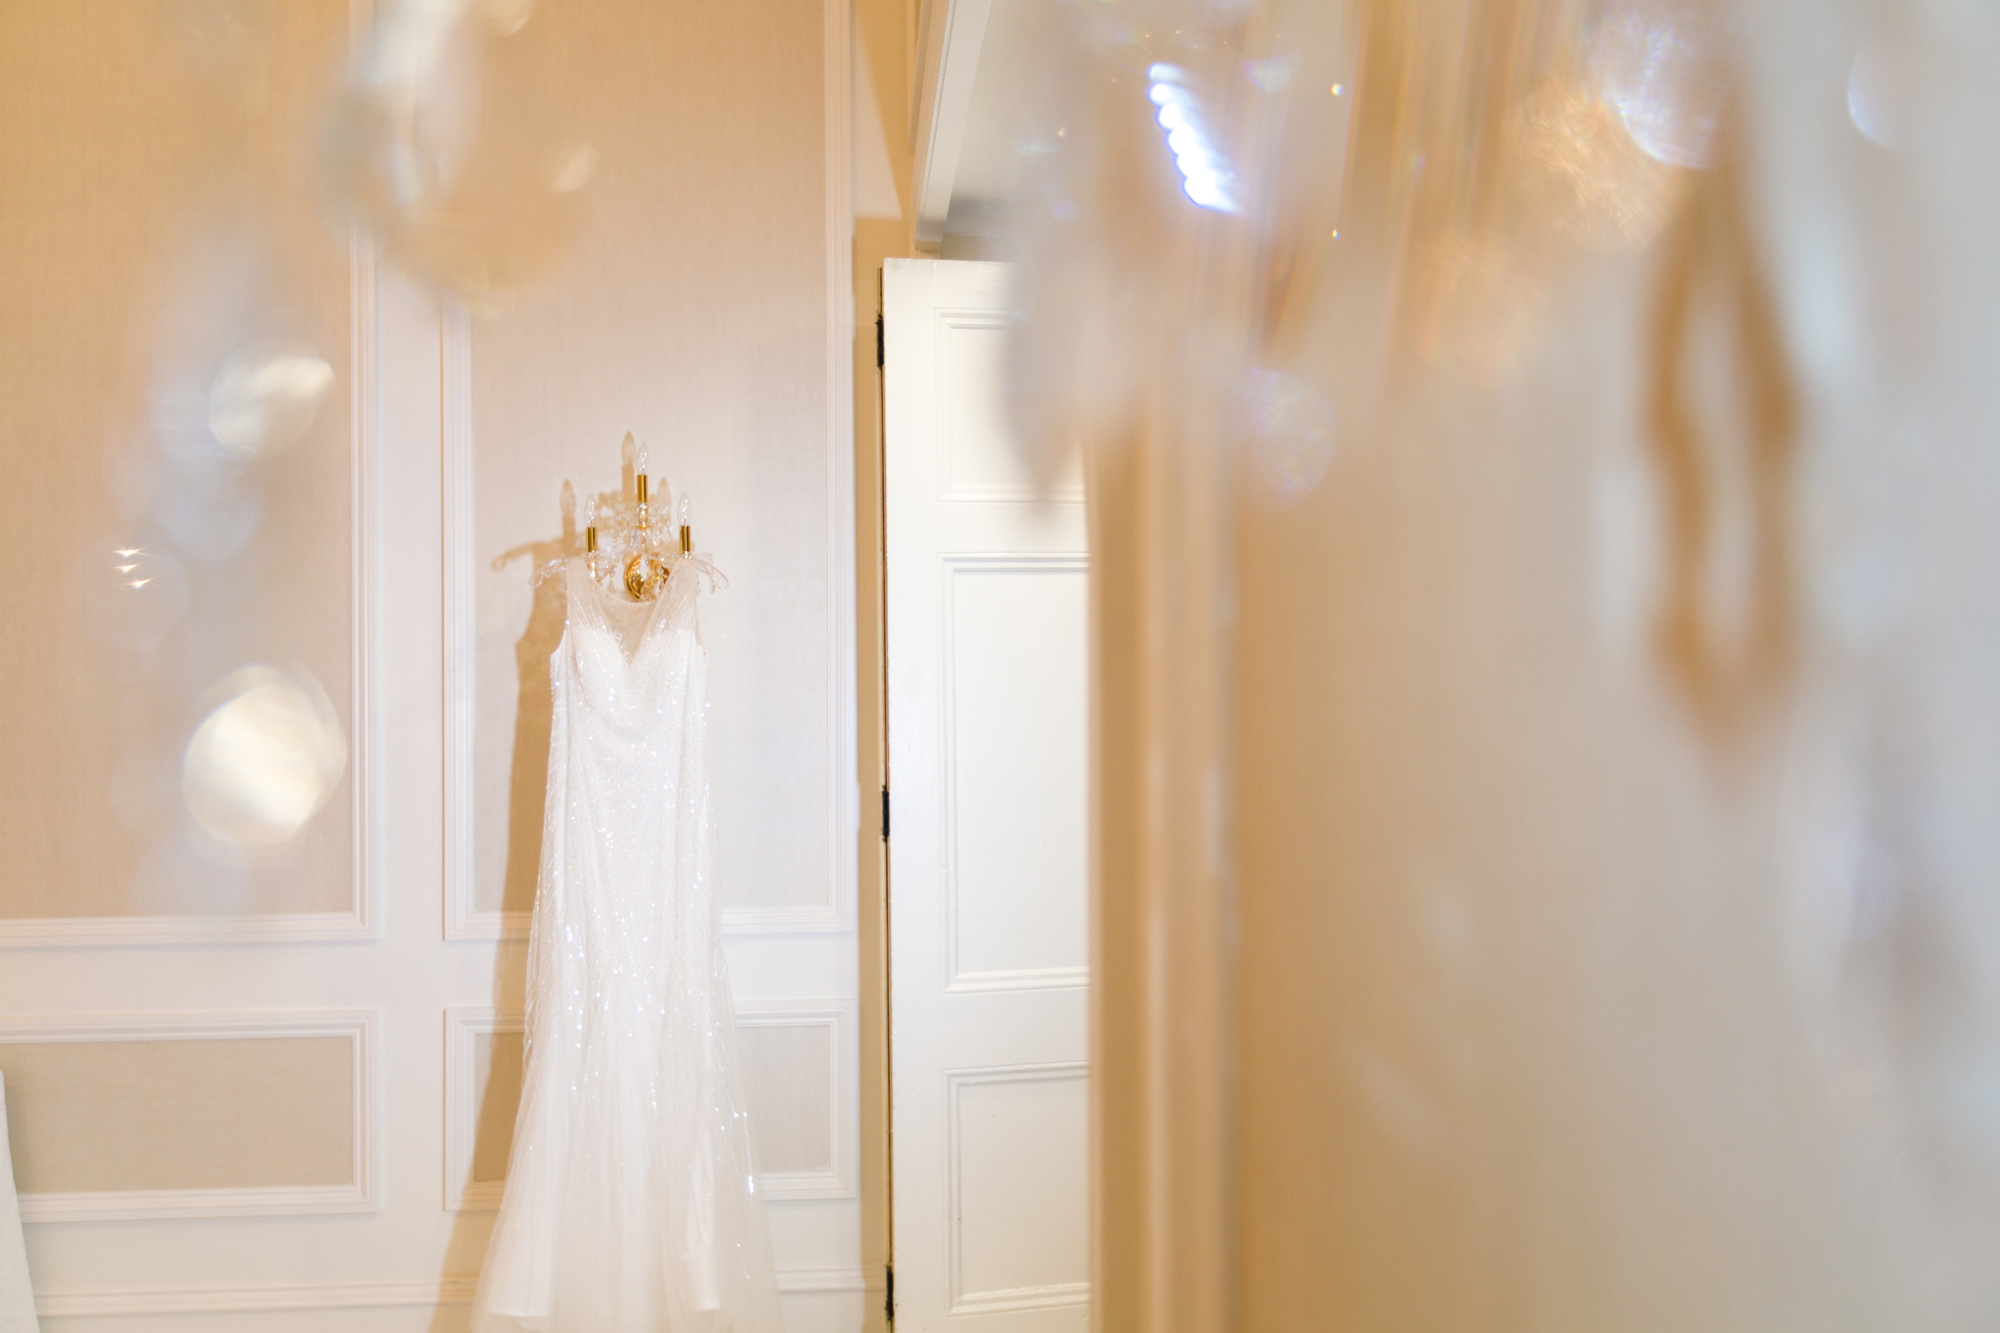 015-lord-nelson-wedding------.jpg